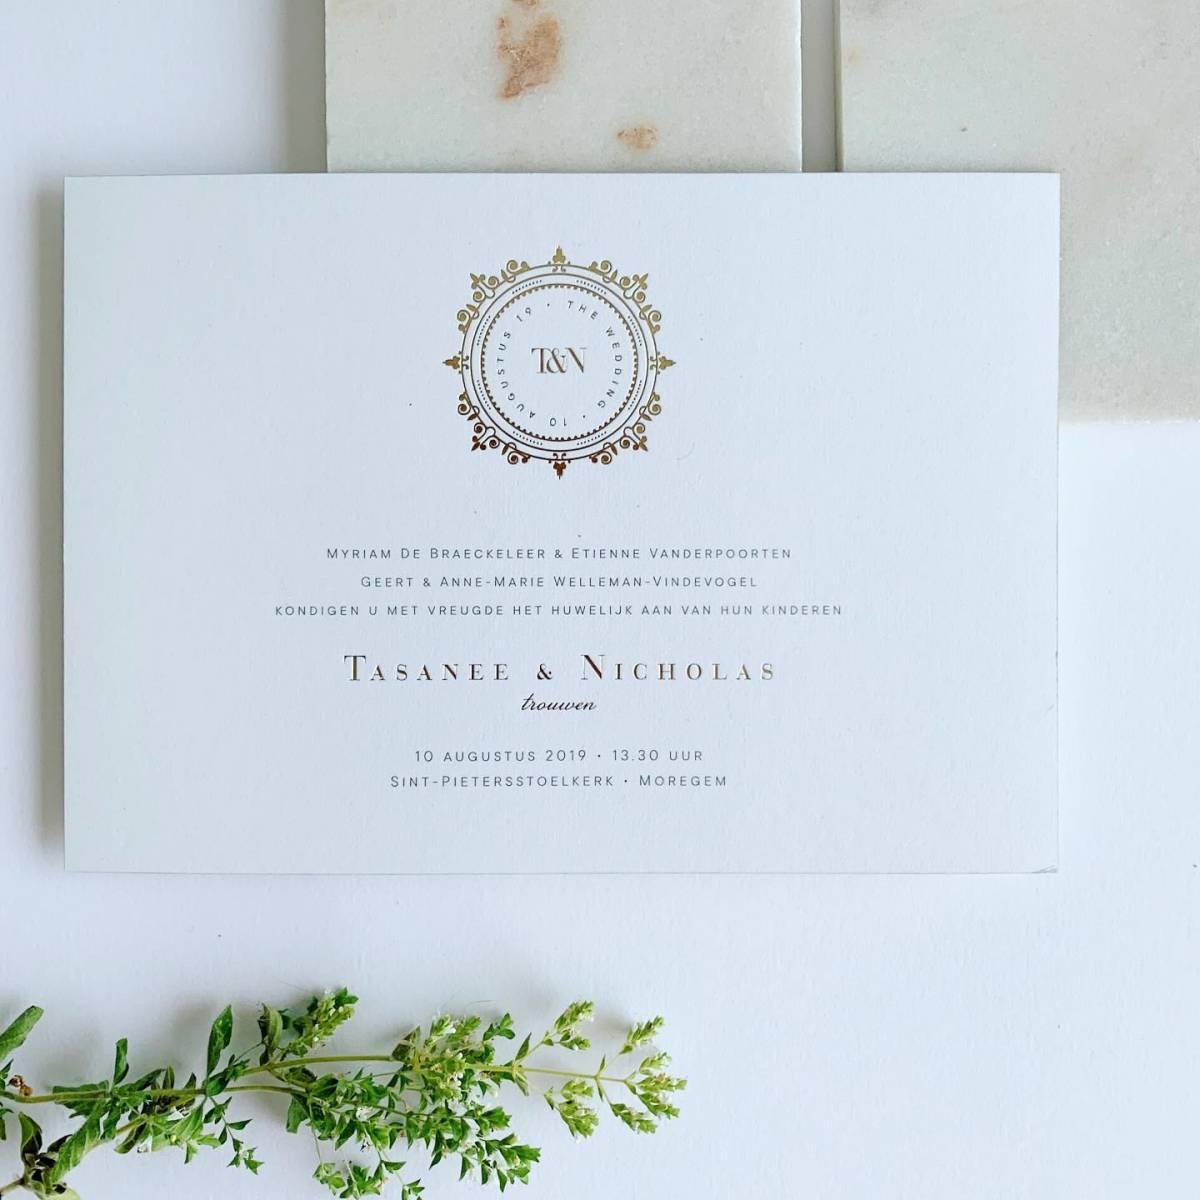 Scarabar - Trouwuitnodiging - Huwelijksuitnodiging - Drukwerk - Huwelijk - Trouw - Bruiloft - House of Weddings - 41